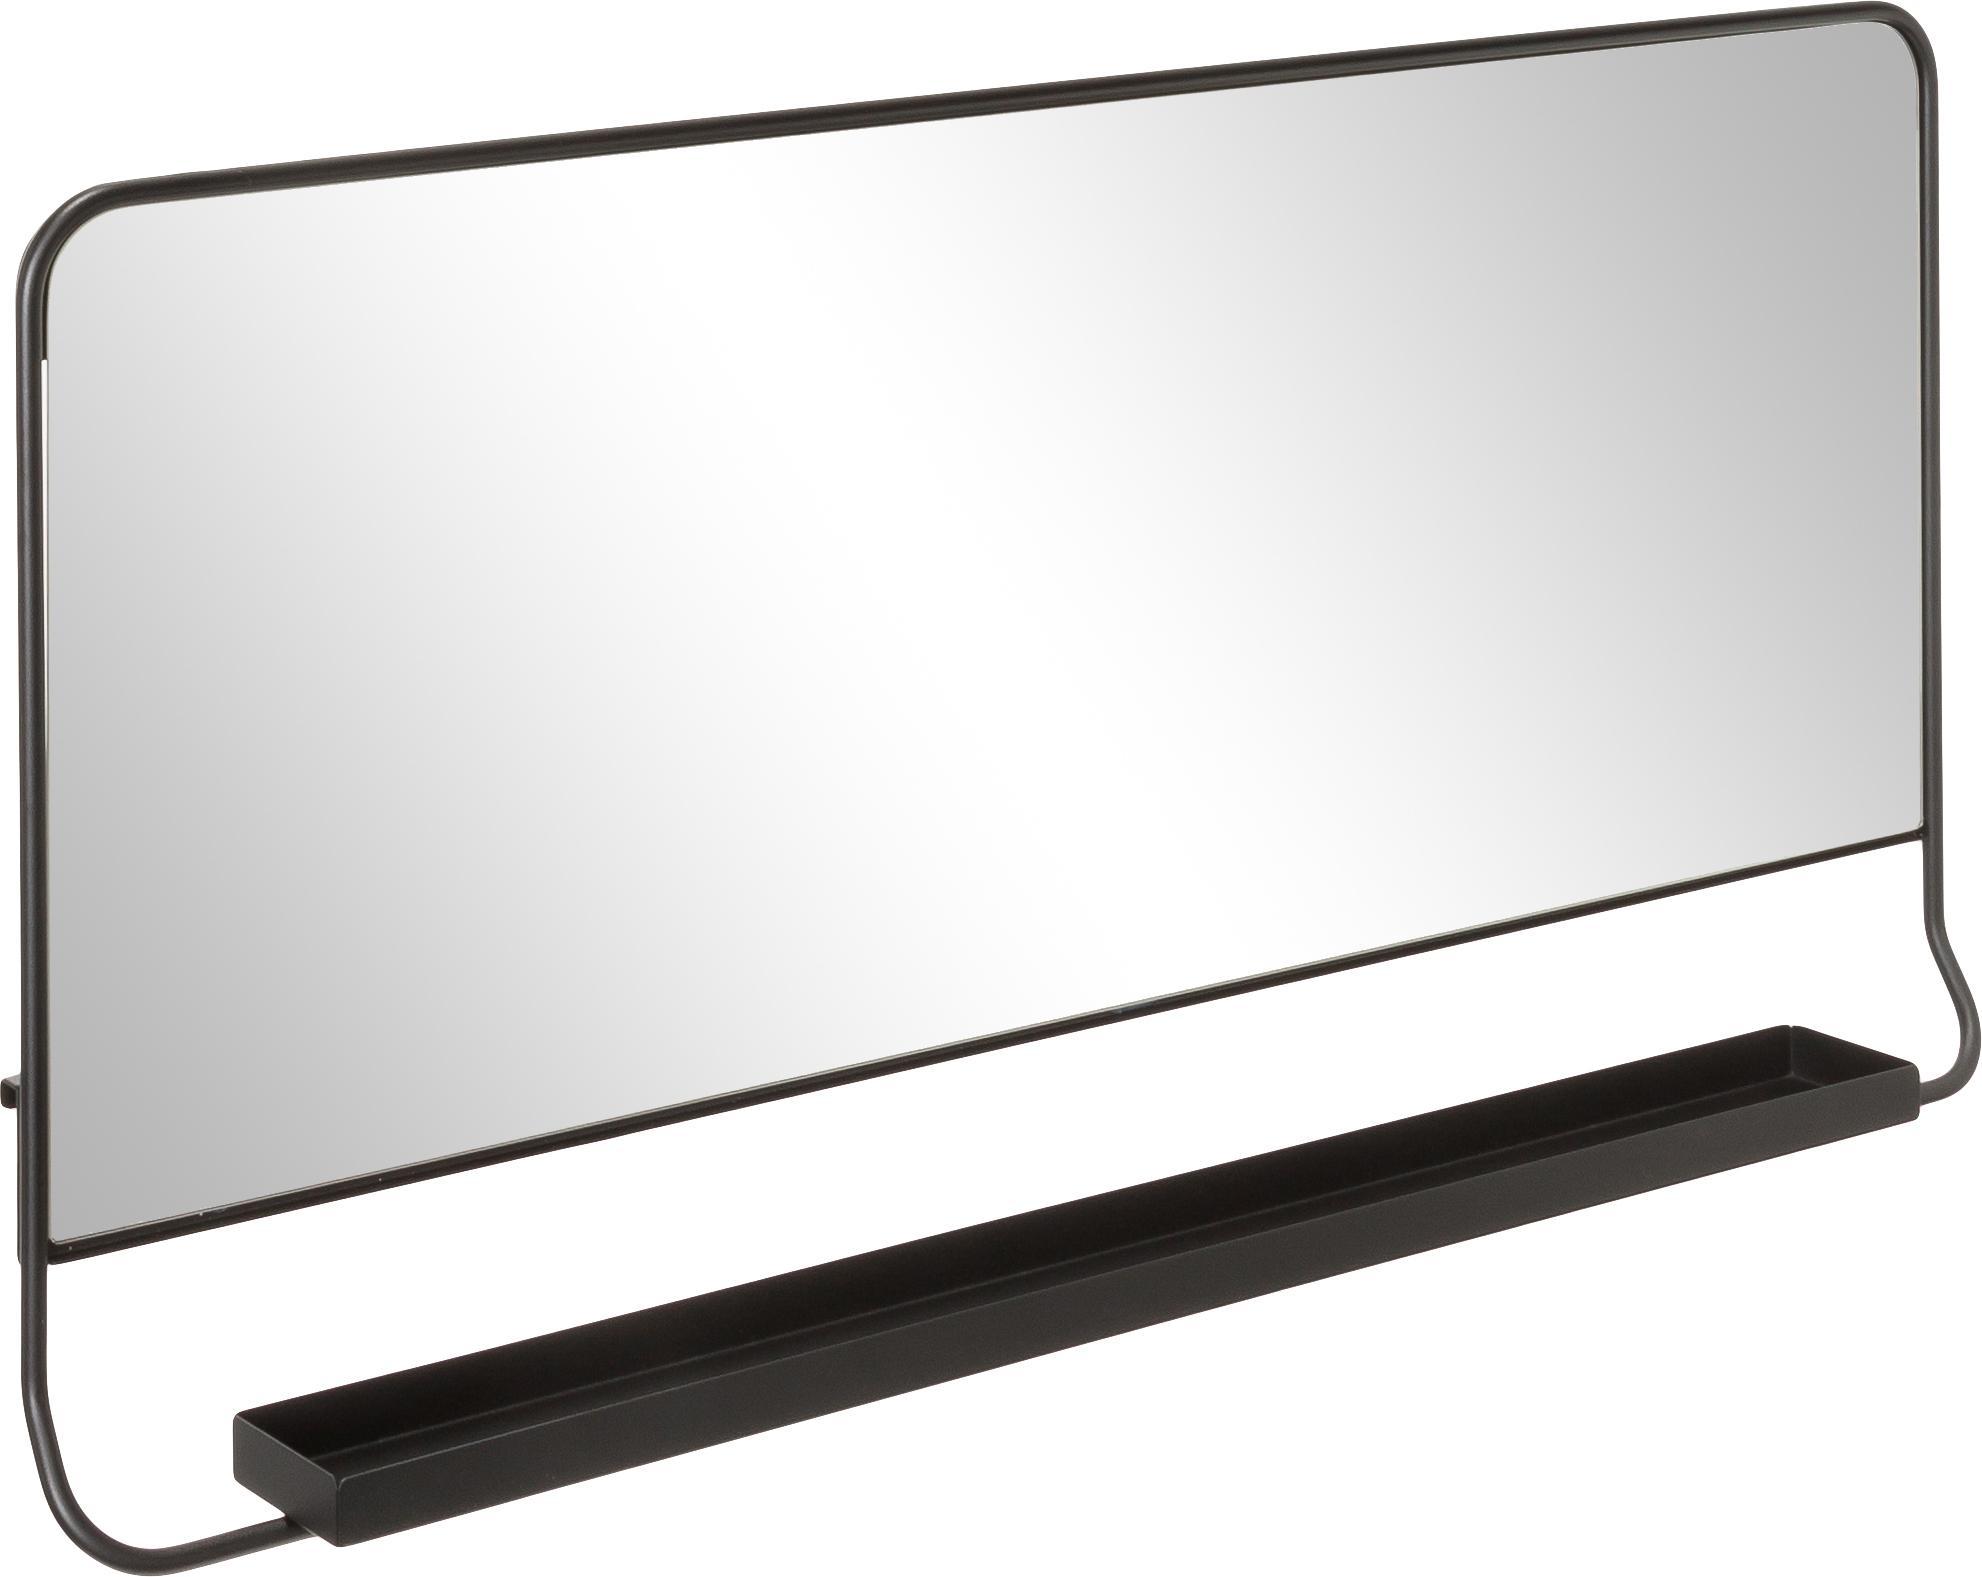 Espejo de pared Chic, con estante, Negro, An 80 x Al 40 cm